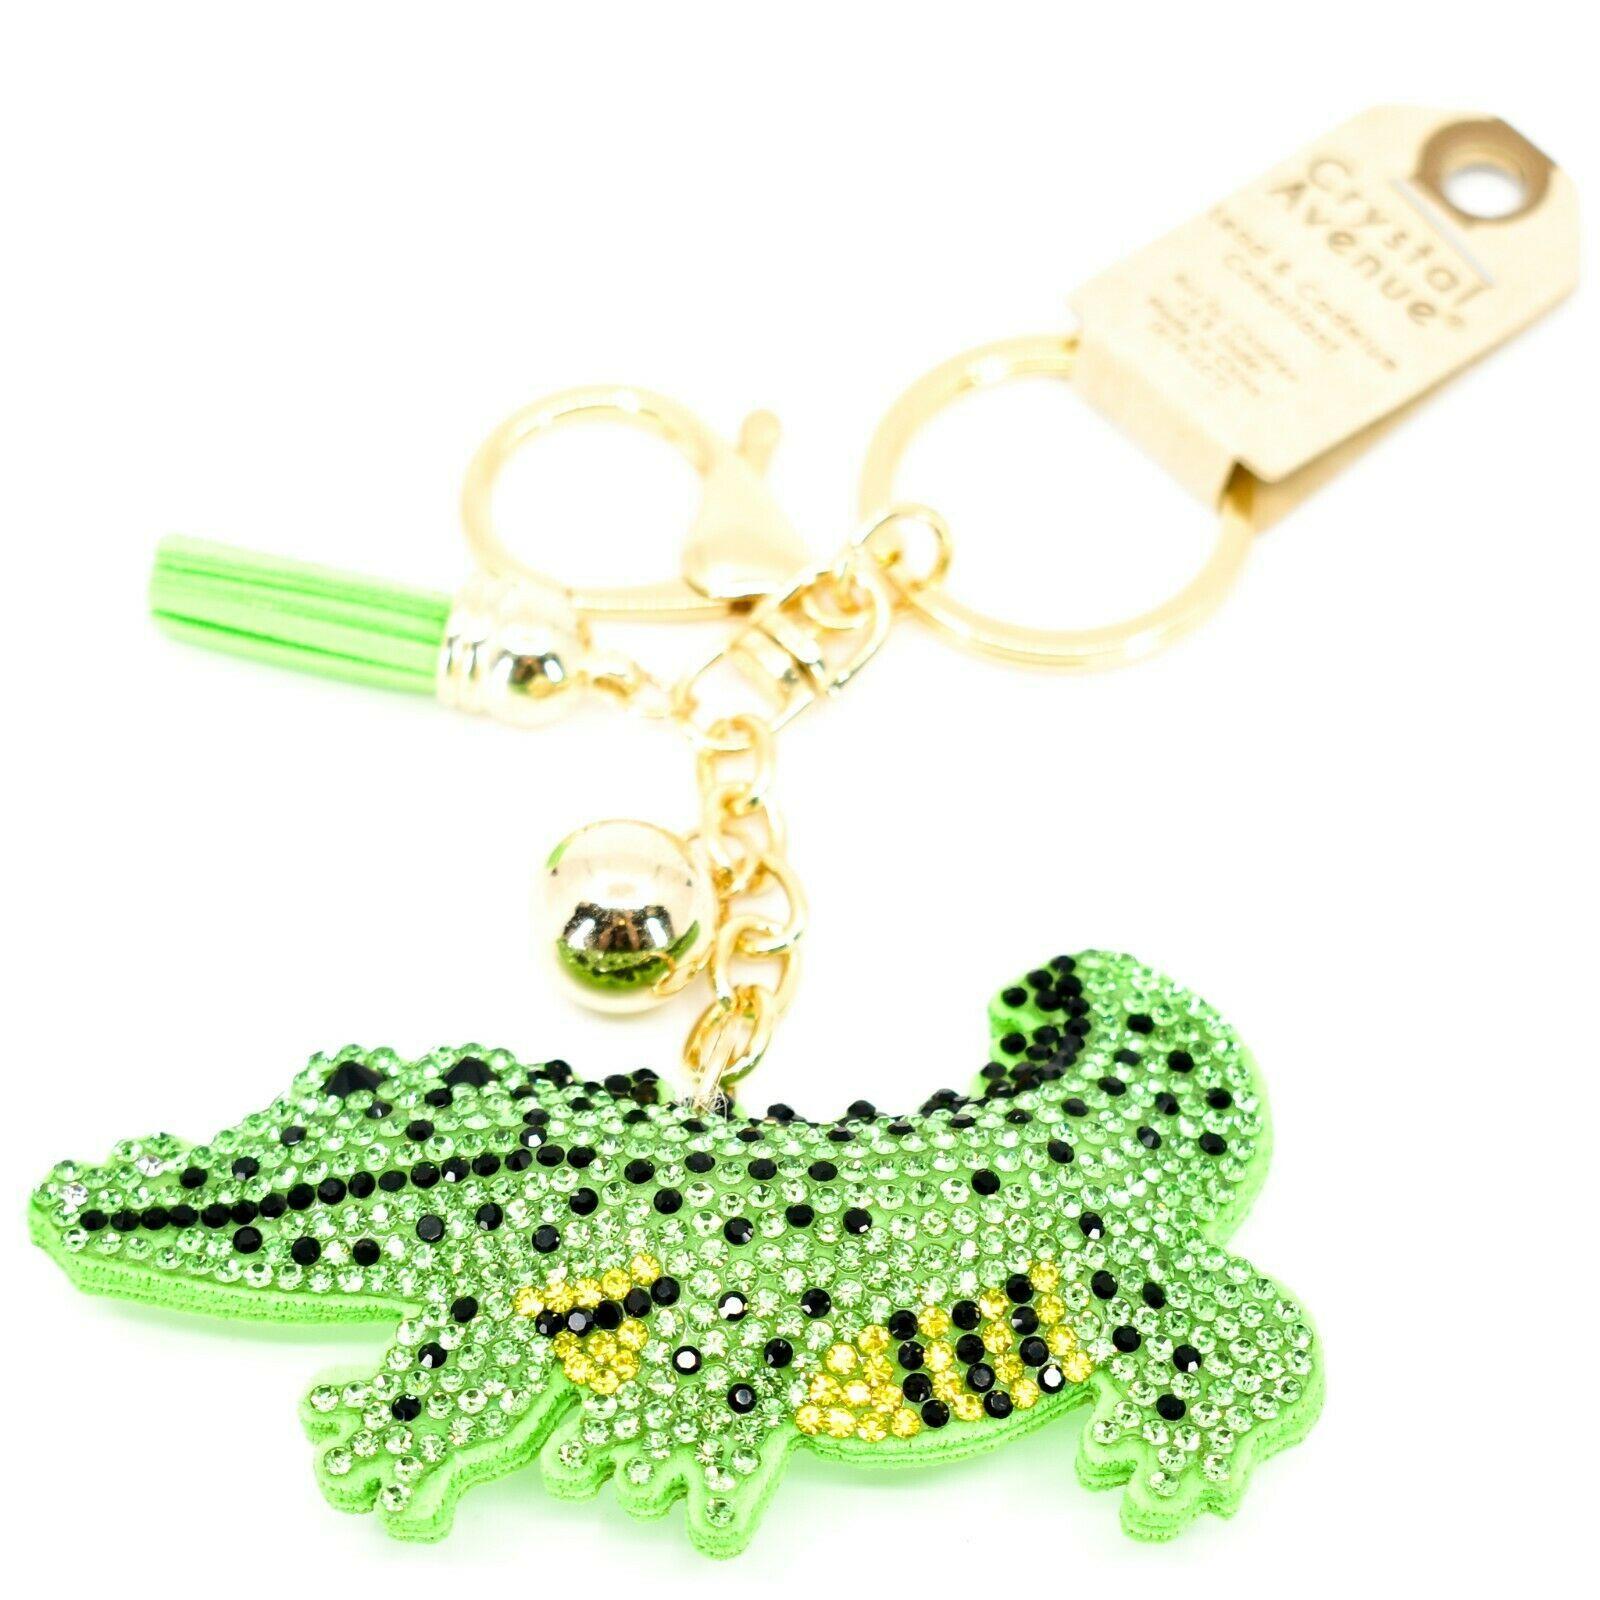 Pave Crystal Accent 3D Stuffed Pillow Alligator Crocodile Keychain Key Chain